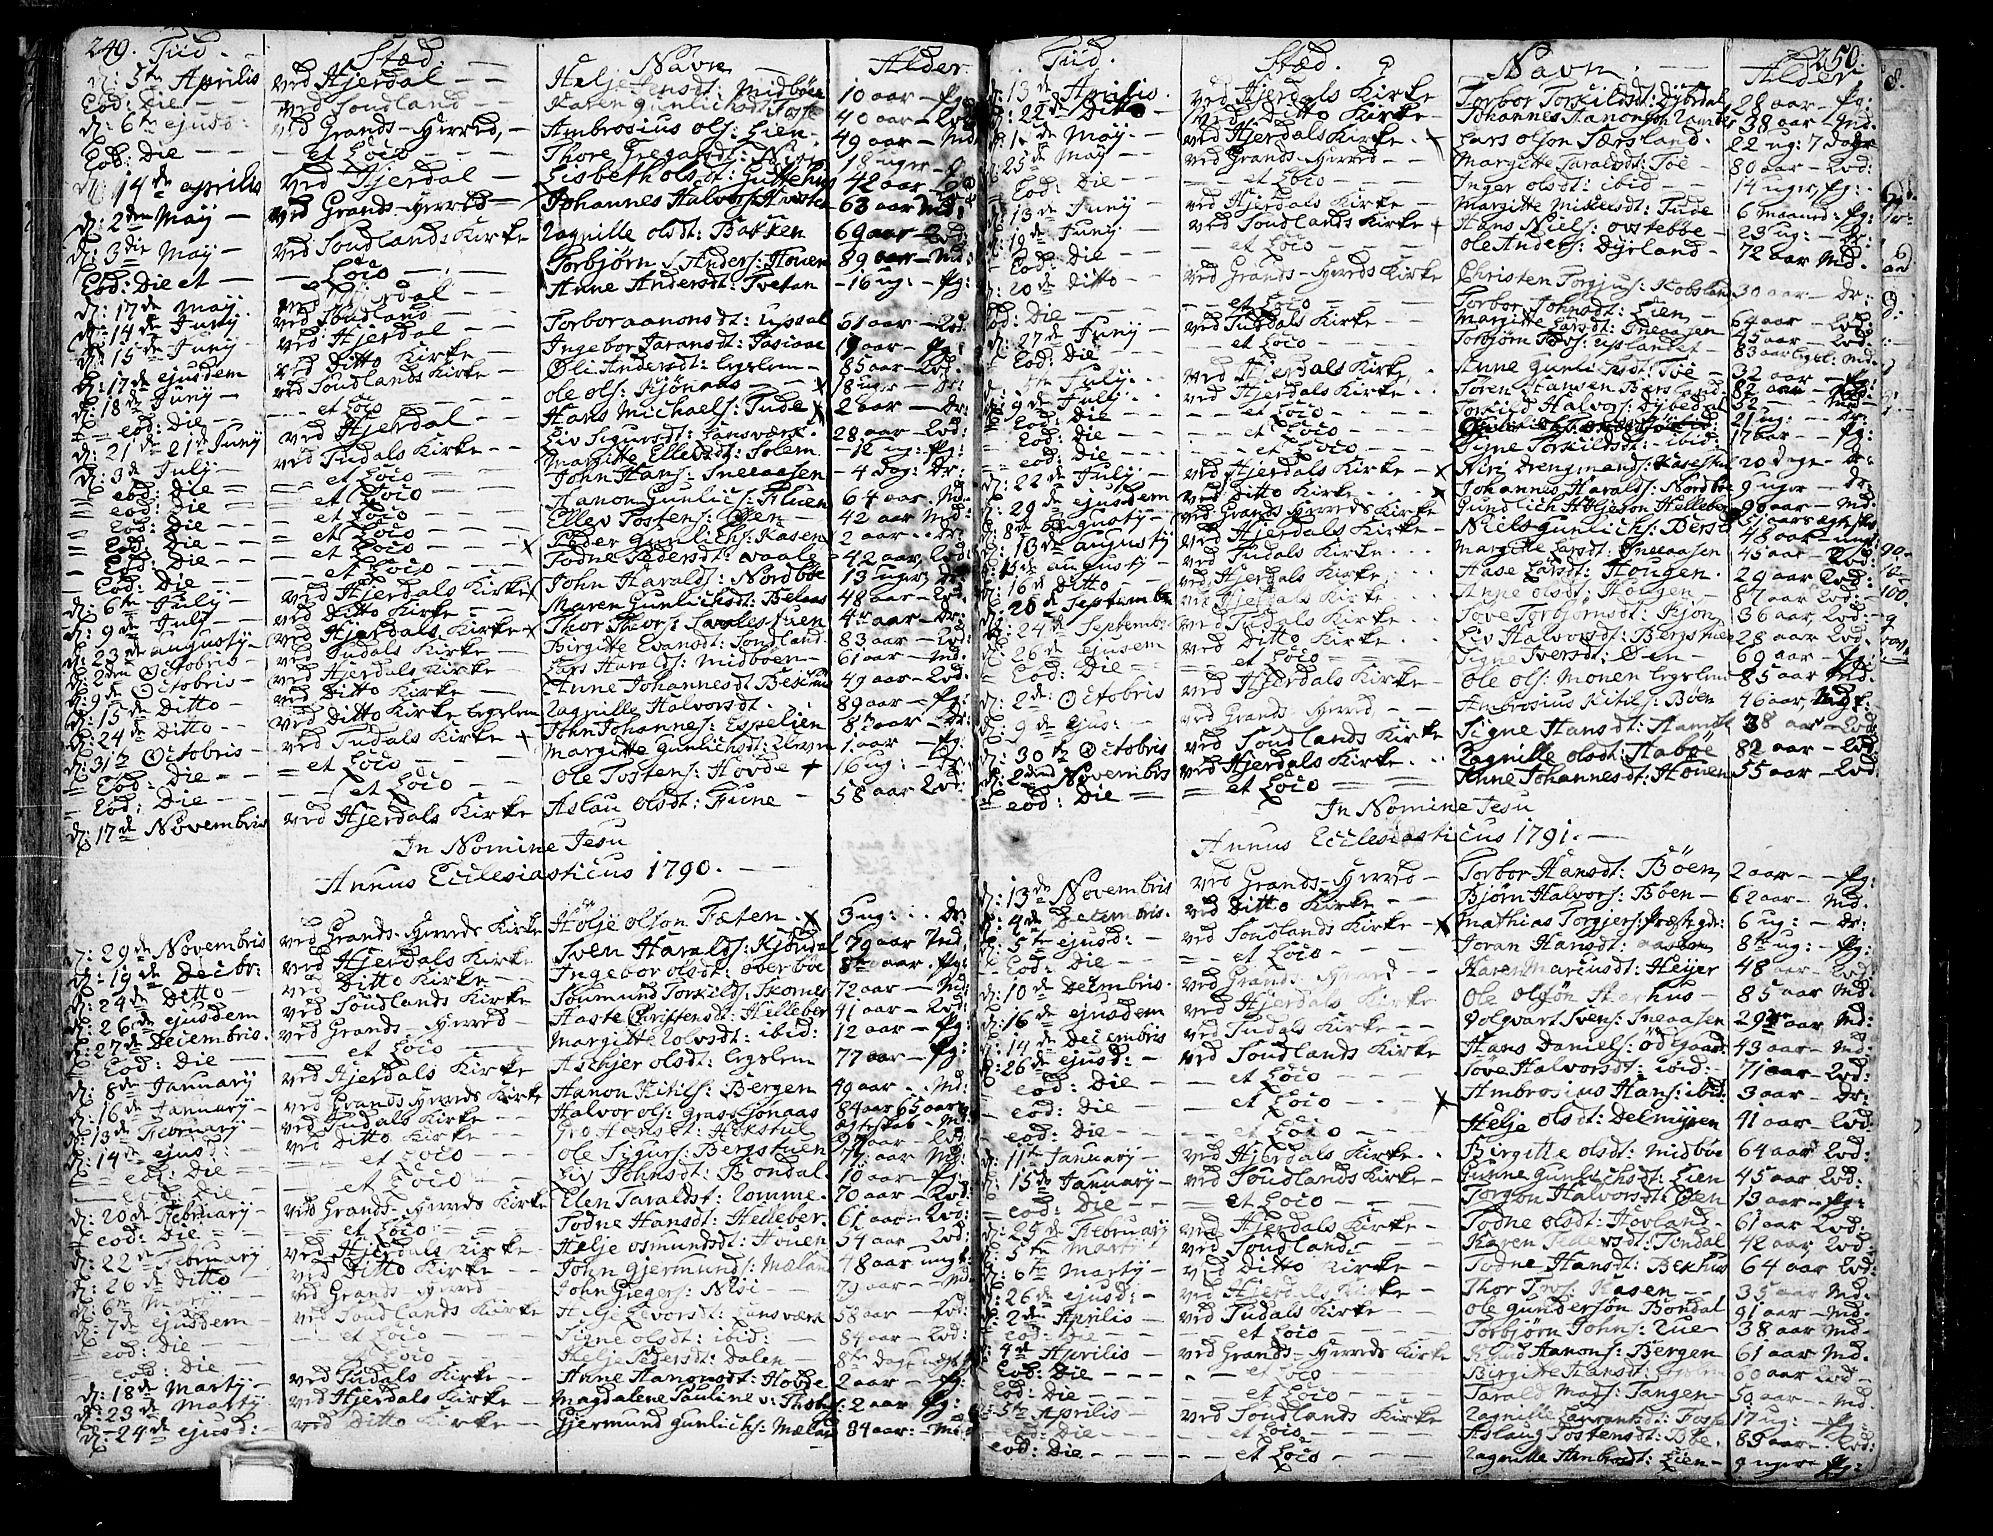 SAKO, Hjartdal kirkebøker, F/Fa/L0005: Ministerialbok nr. I 5, 1776-1801, s. 249-250